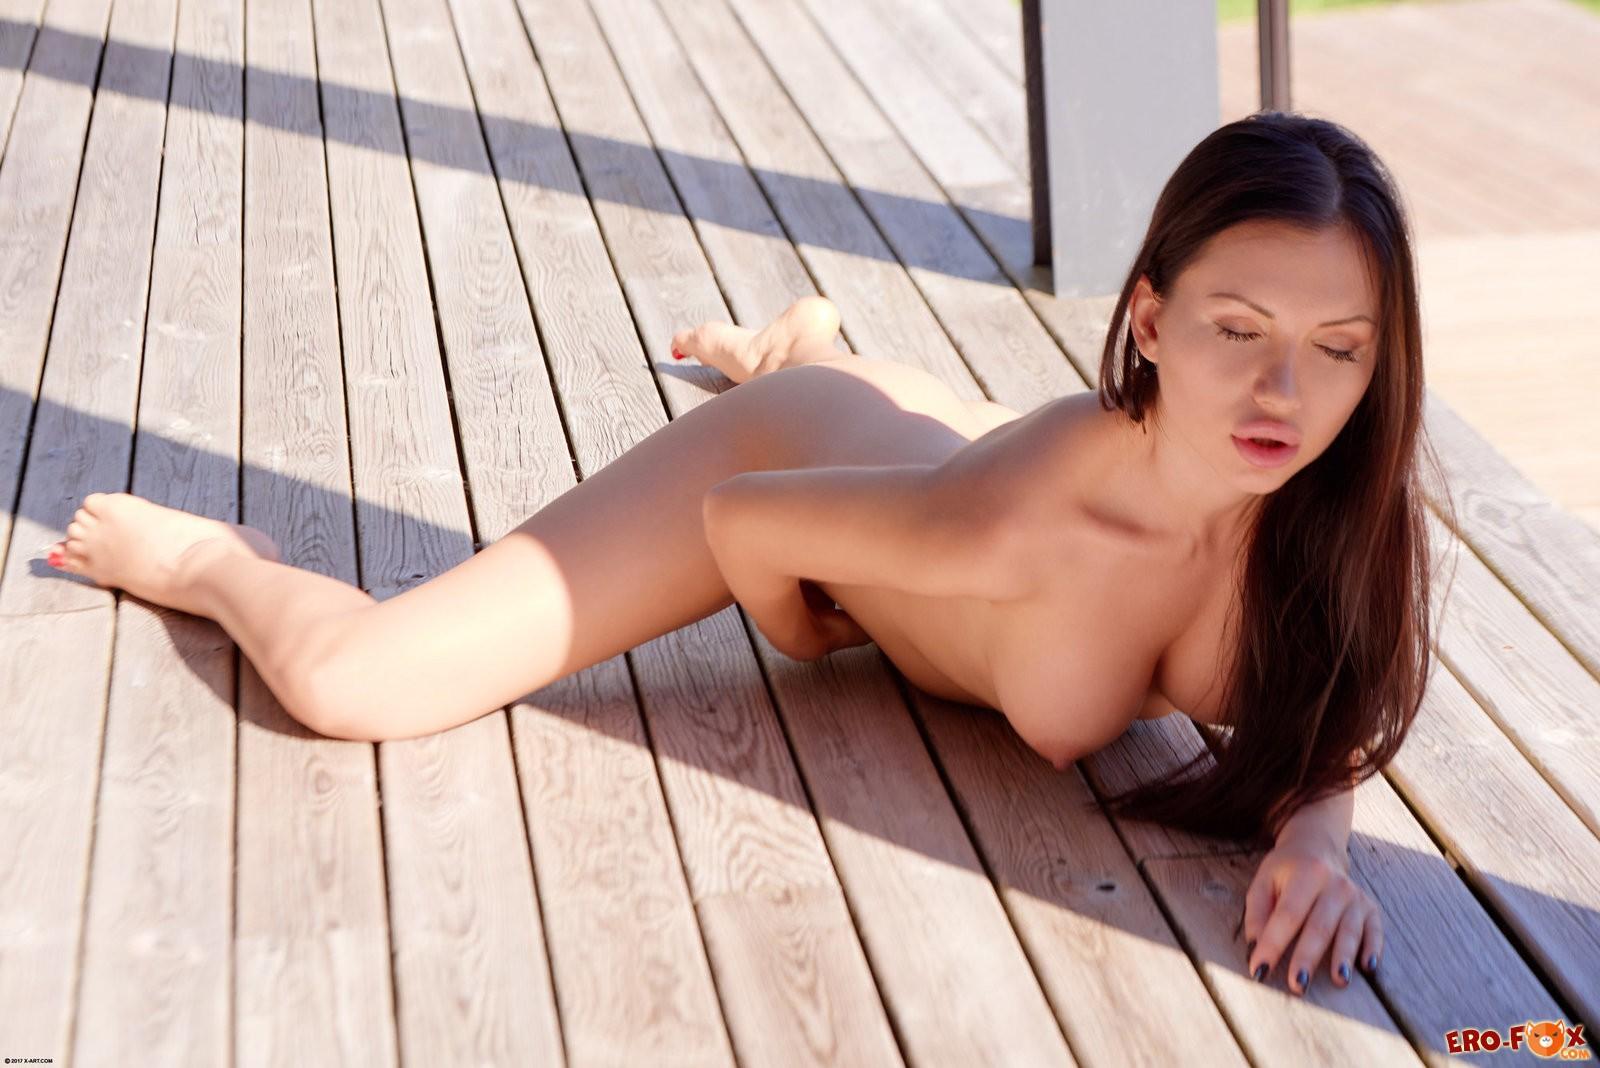 Сексуальная брюнетка загорает голая .